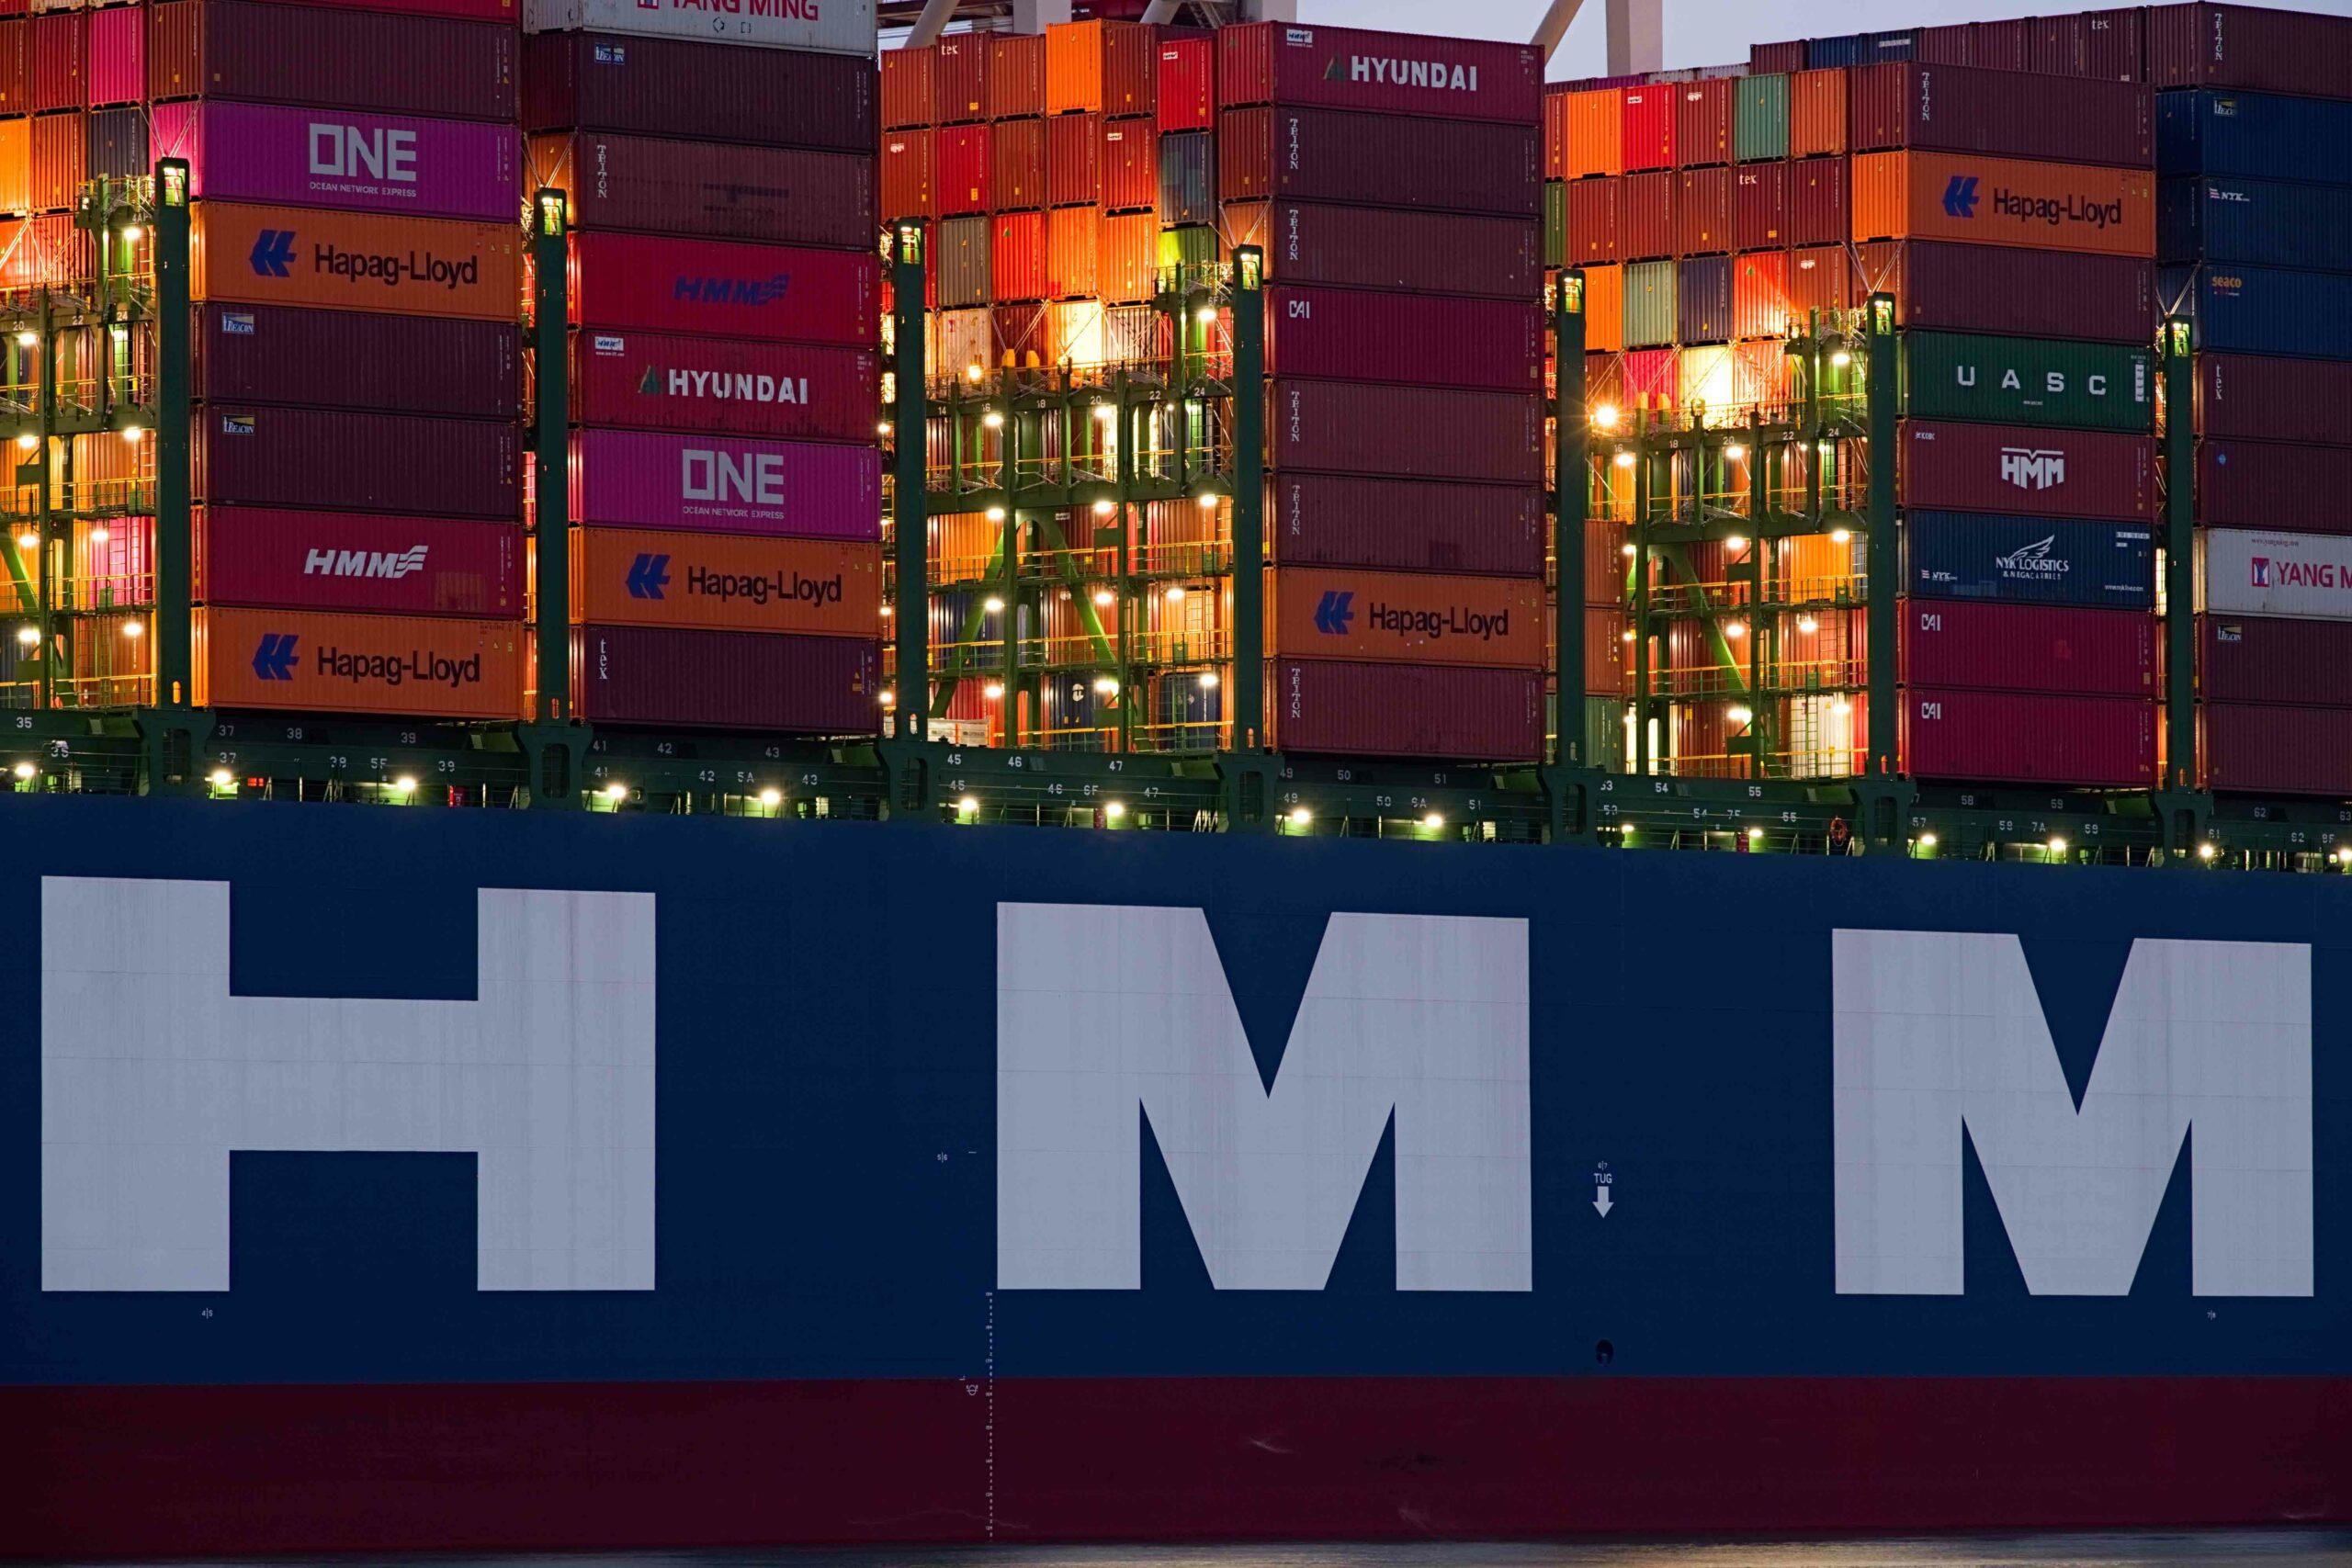 https://www.freightwaves.com/news/12-hmm-container-ships-sticker-price-157-billion Alfa Logistics Family